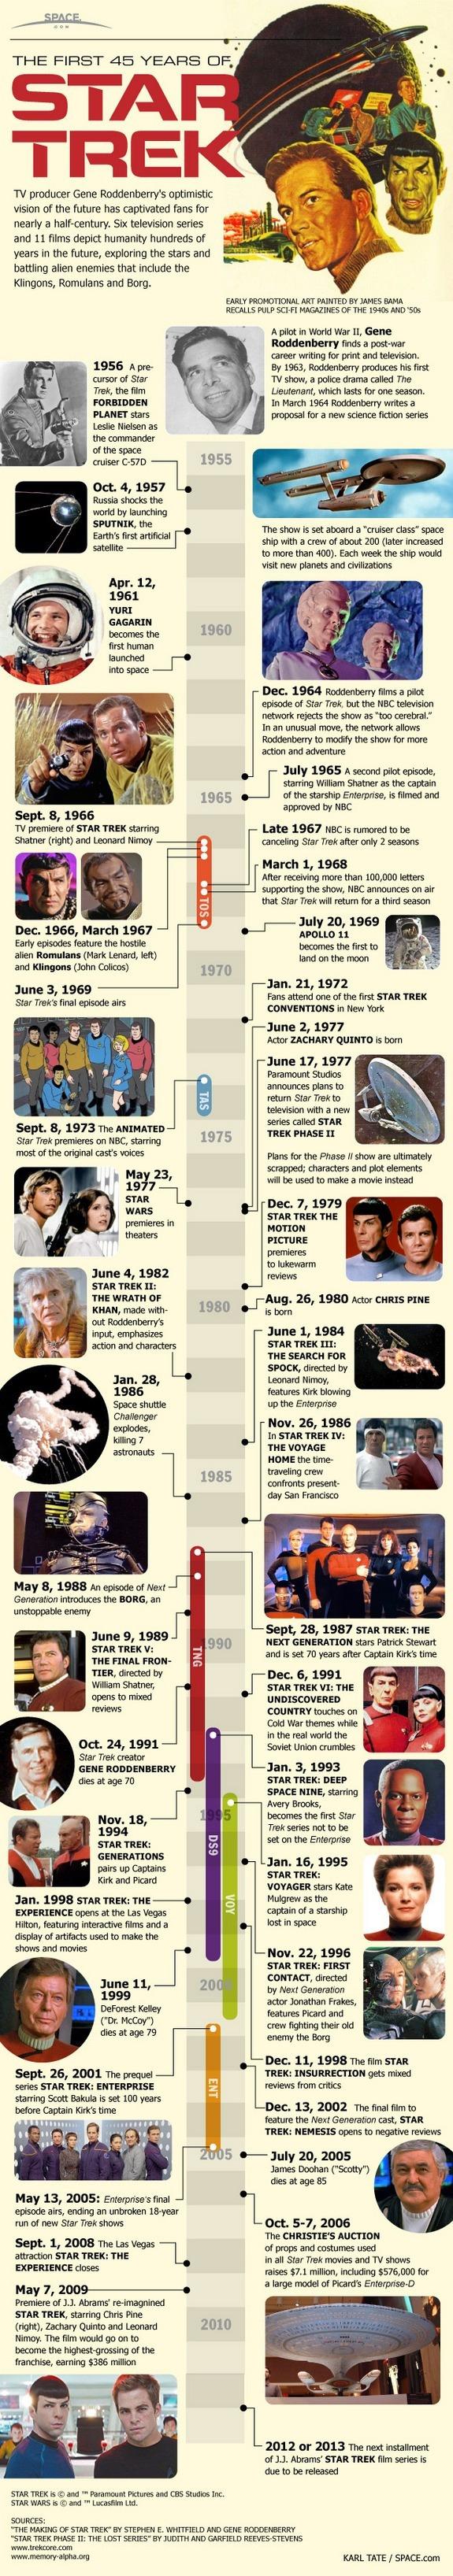 geek anthropology, geek anthropology lessons, depepi, depepi.com